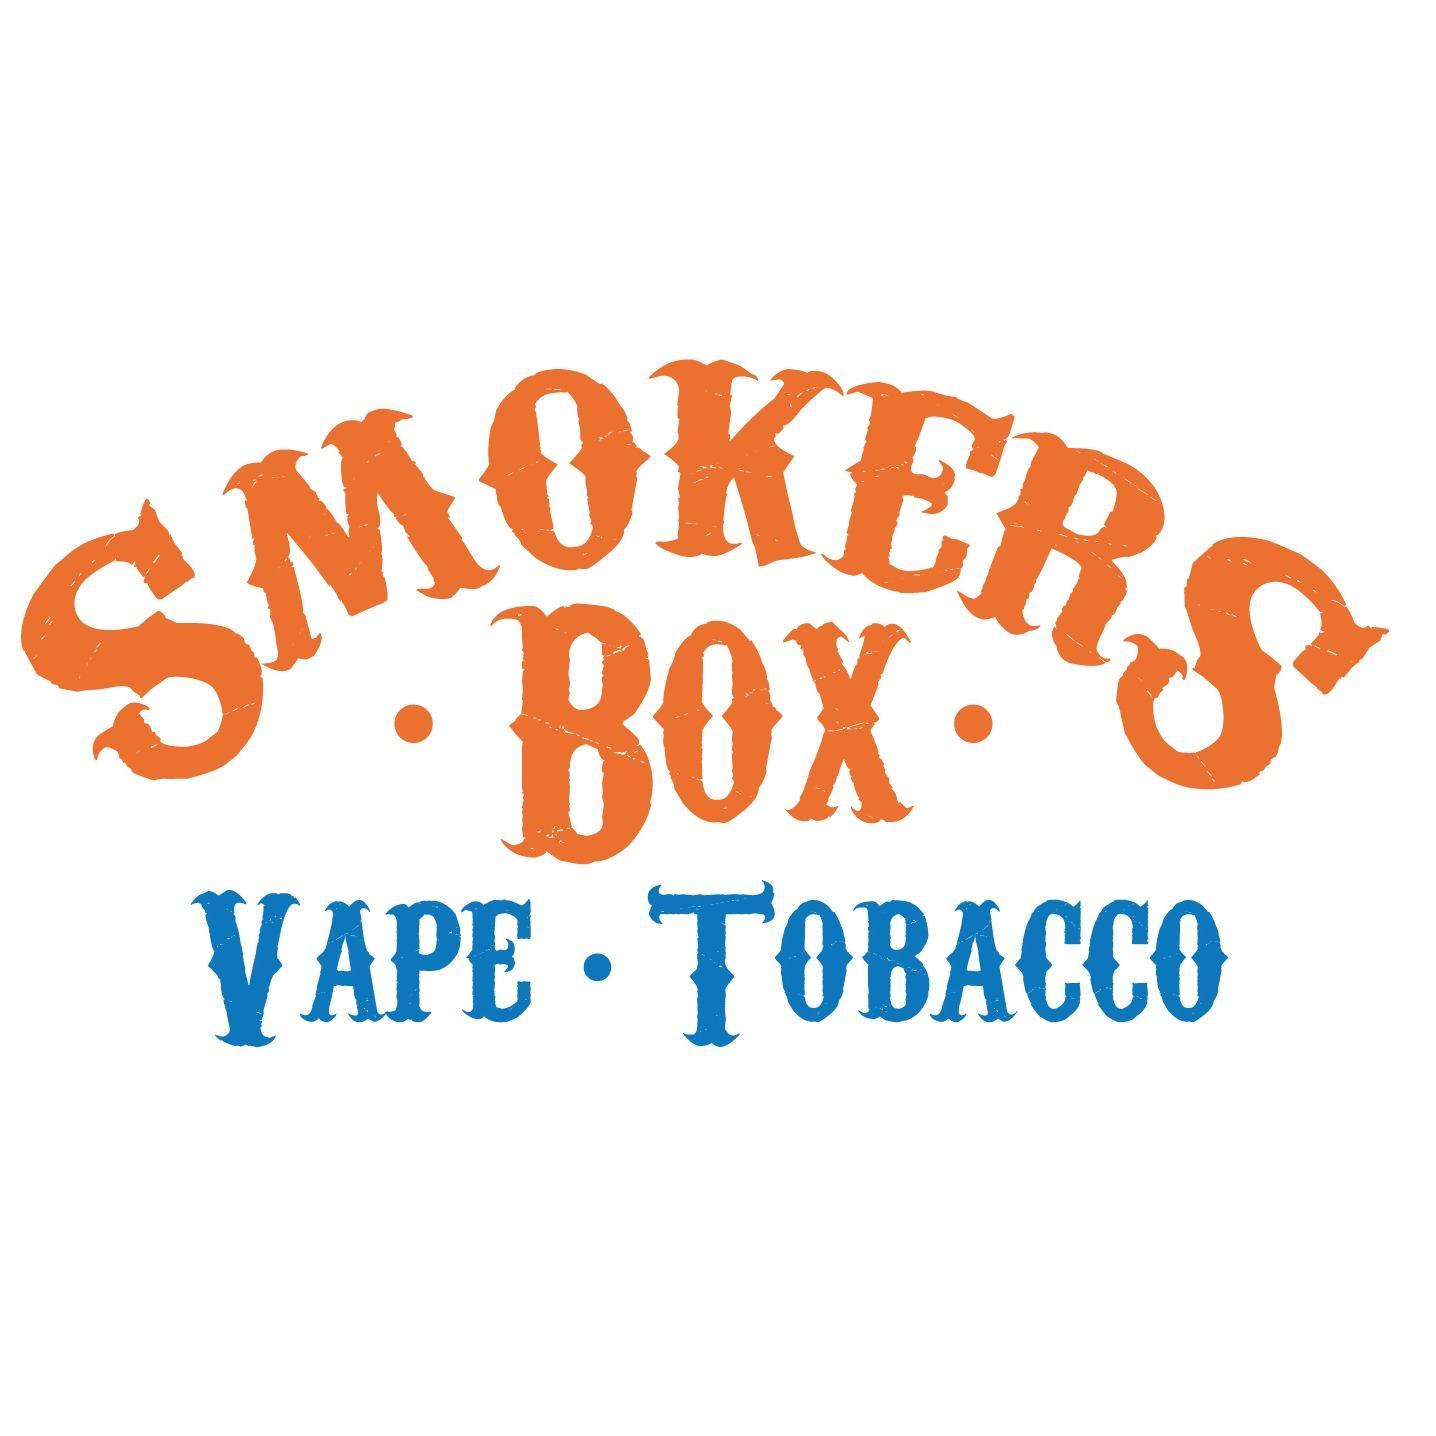 Smokers Box image 5